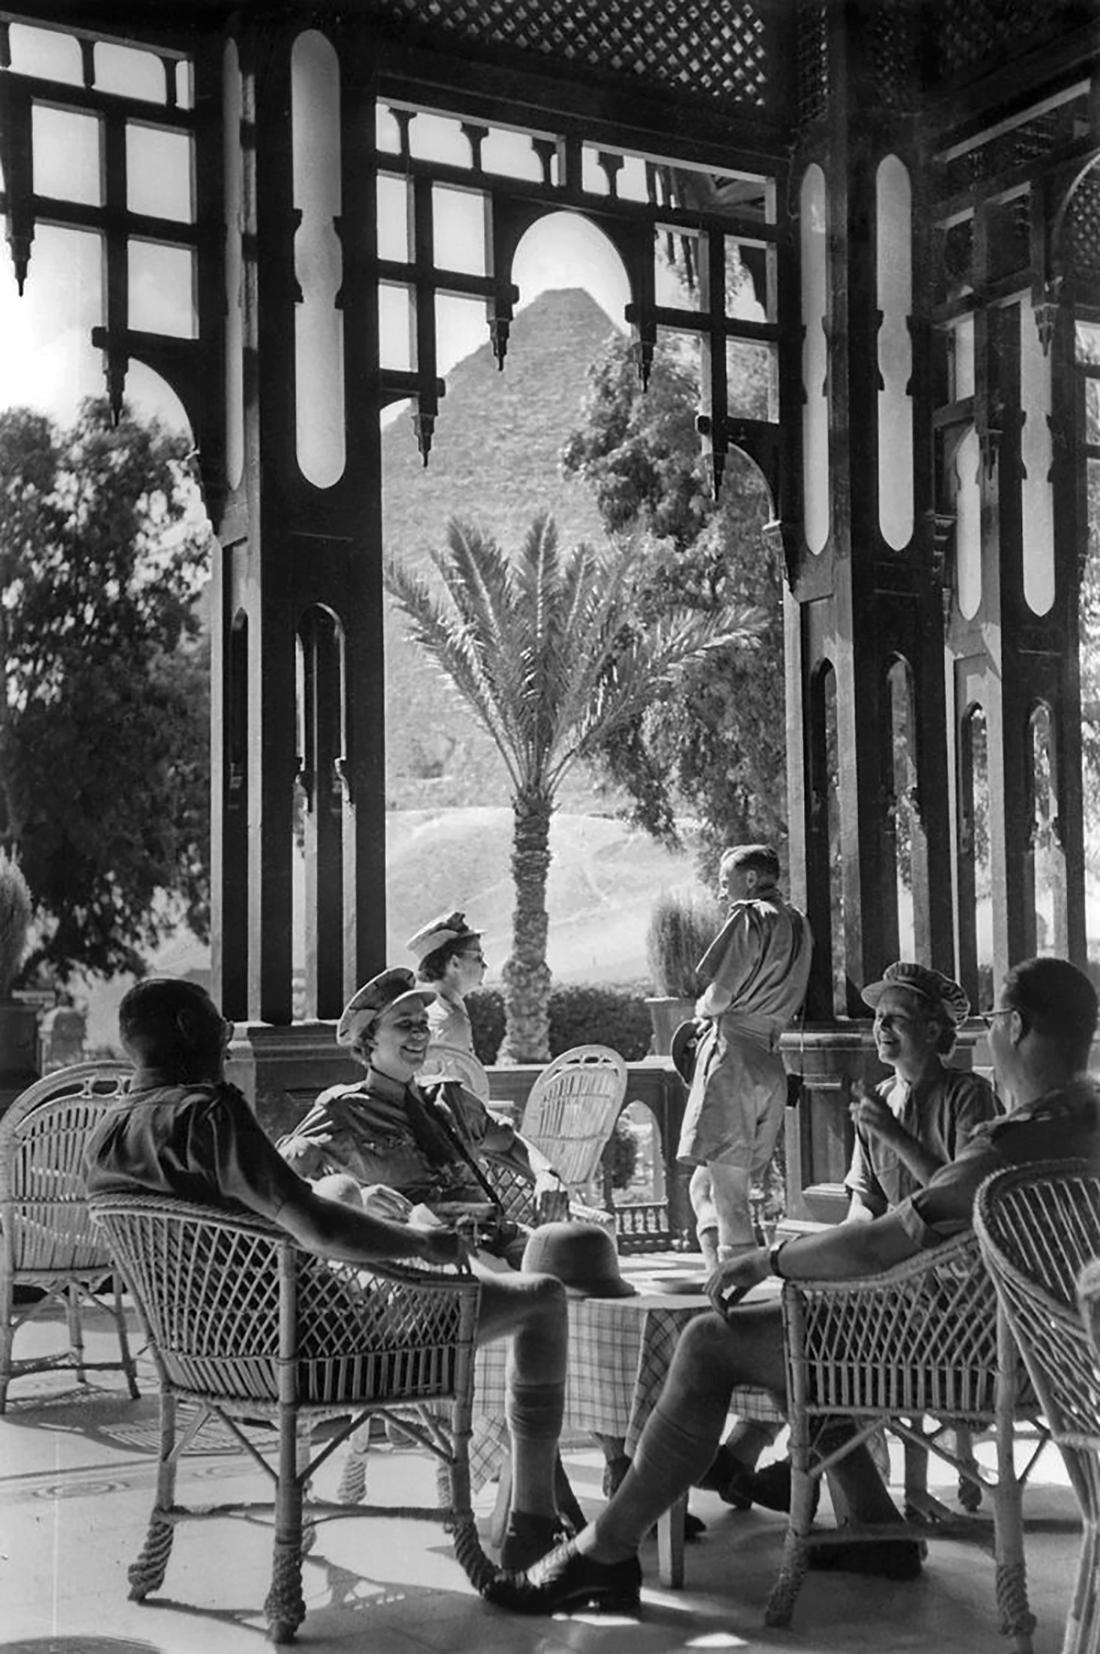 mena house hotel 1920 vintage pyramids cairo